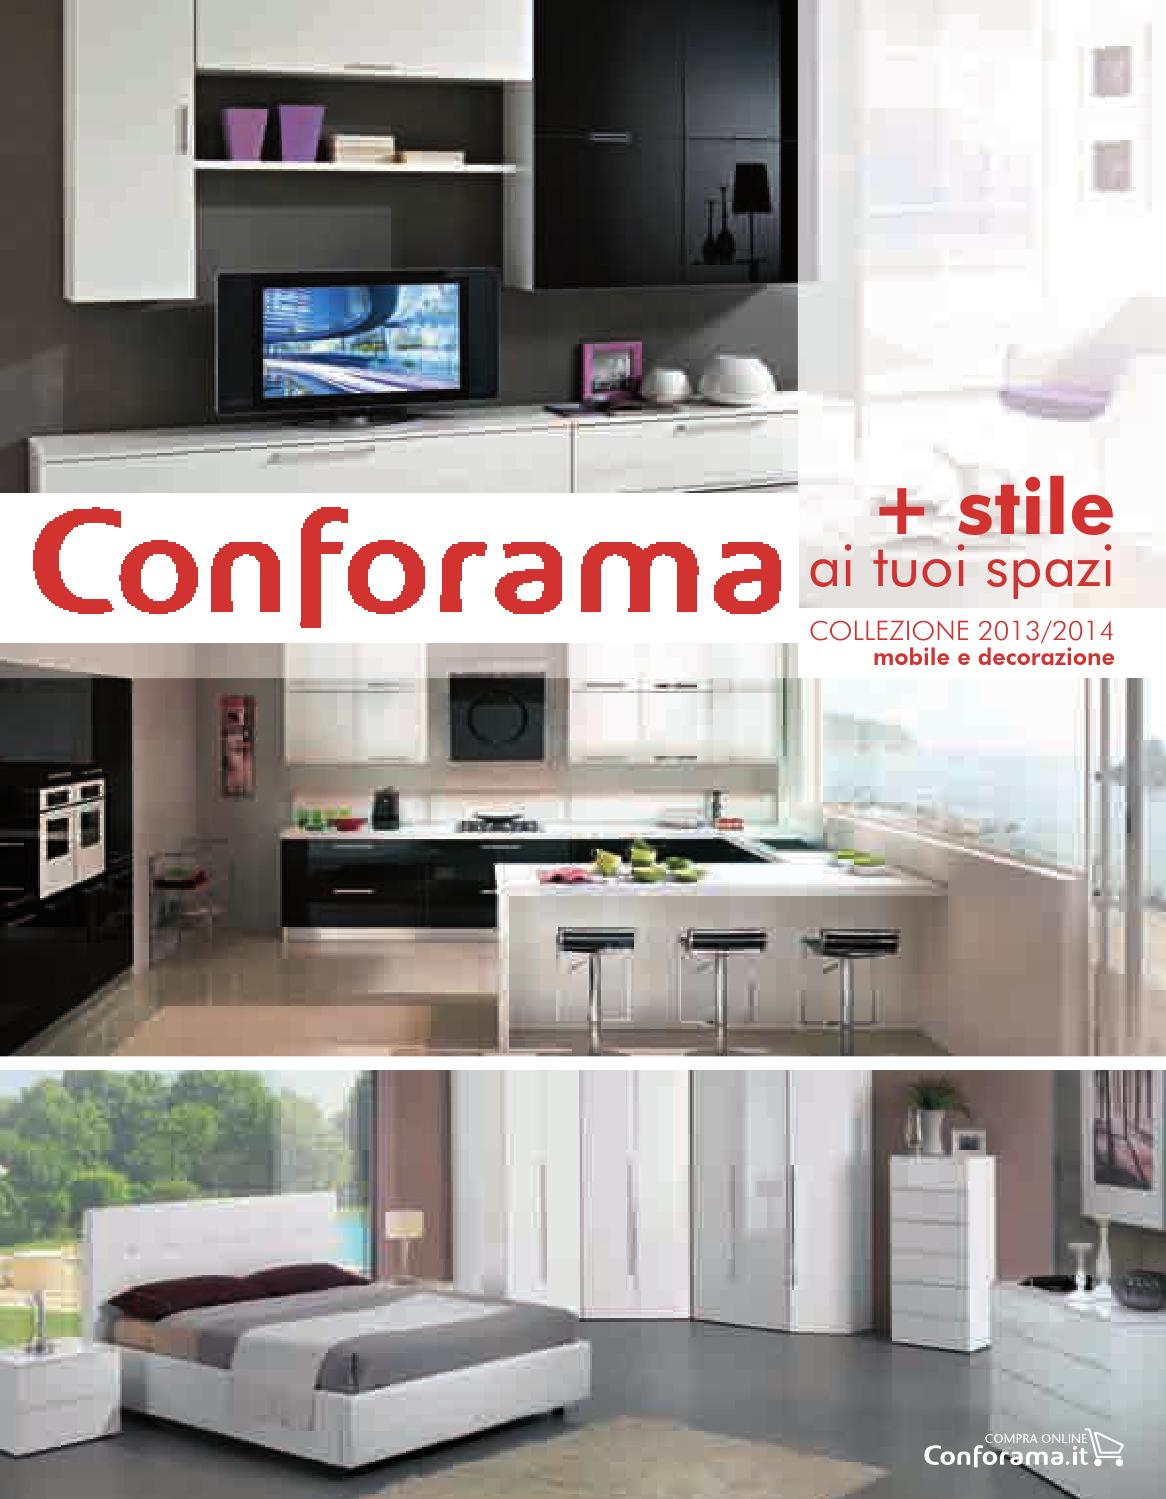 Conforama catalogo generale2014 by Mobilpro - issuu